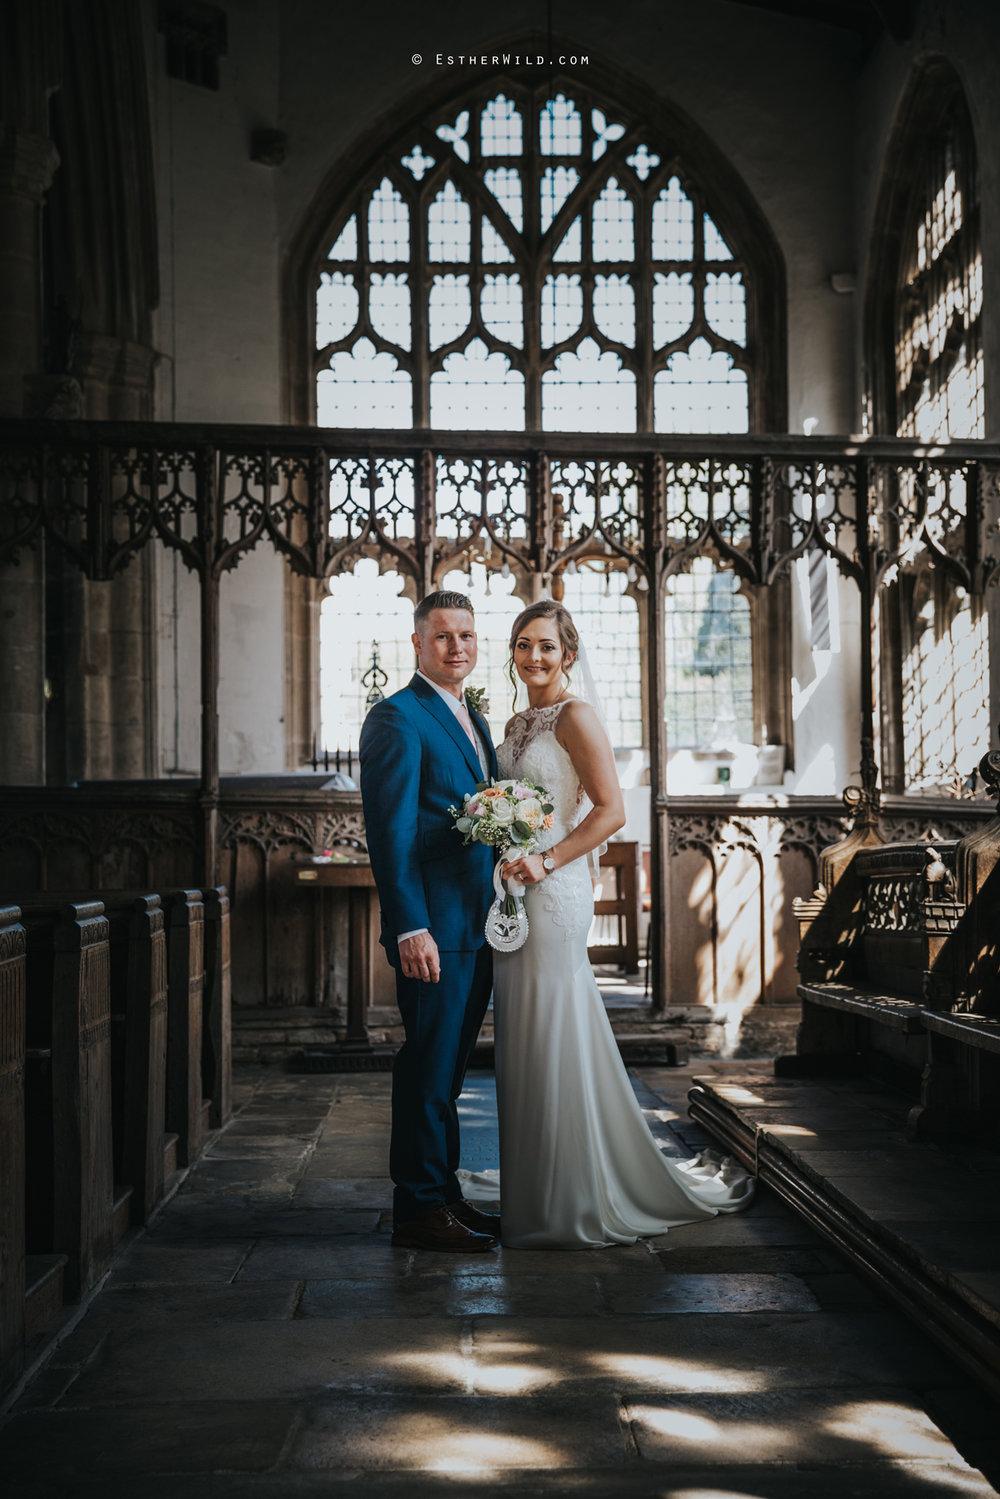 IMG_0907Walpole_St_Andrew_Church_Norfolk_Wedding_Copyright_Esther_Wild_Photographer_.jpg